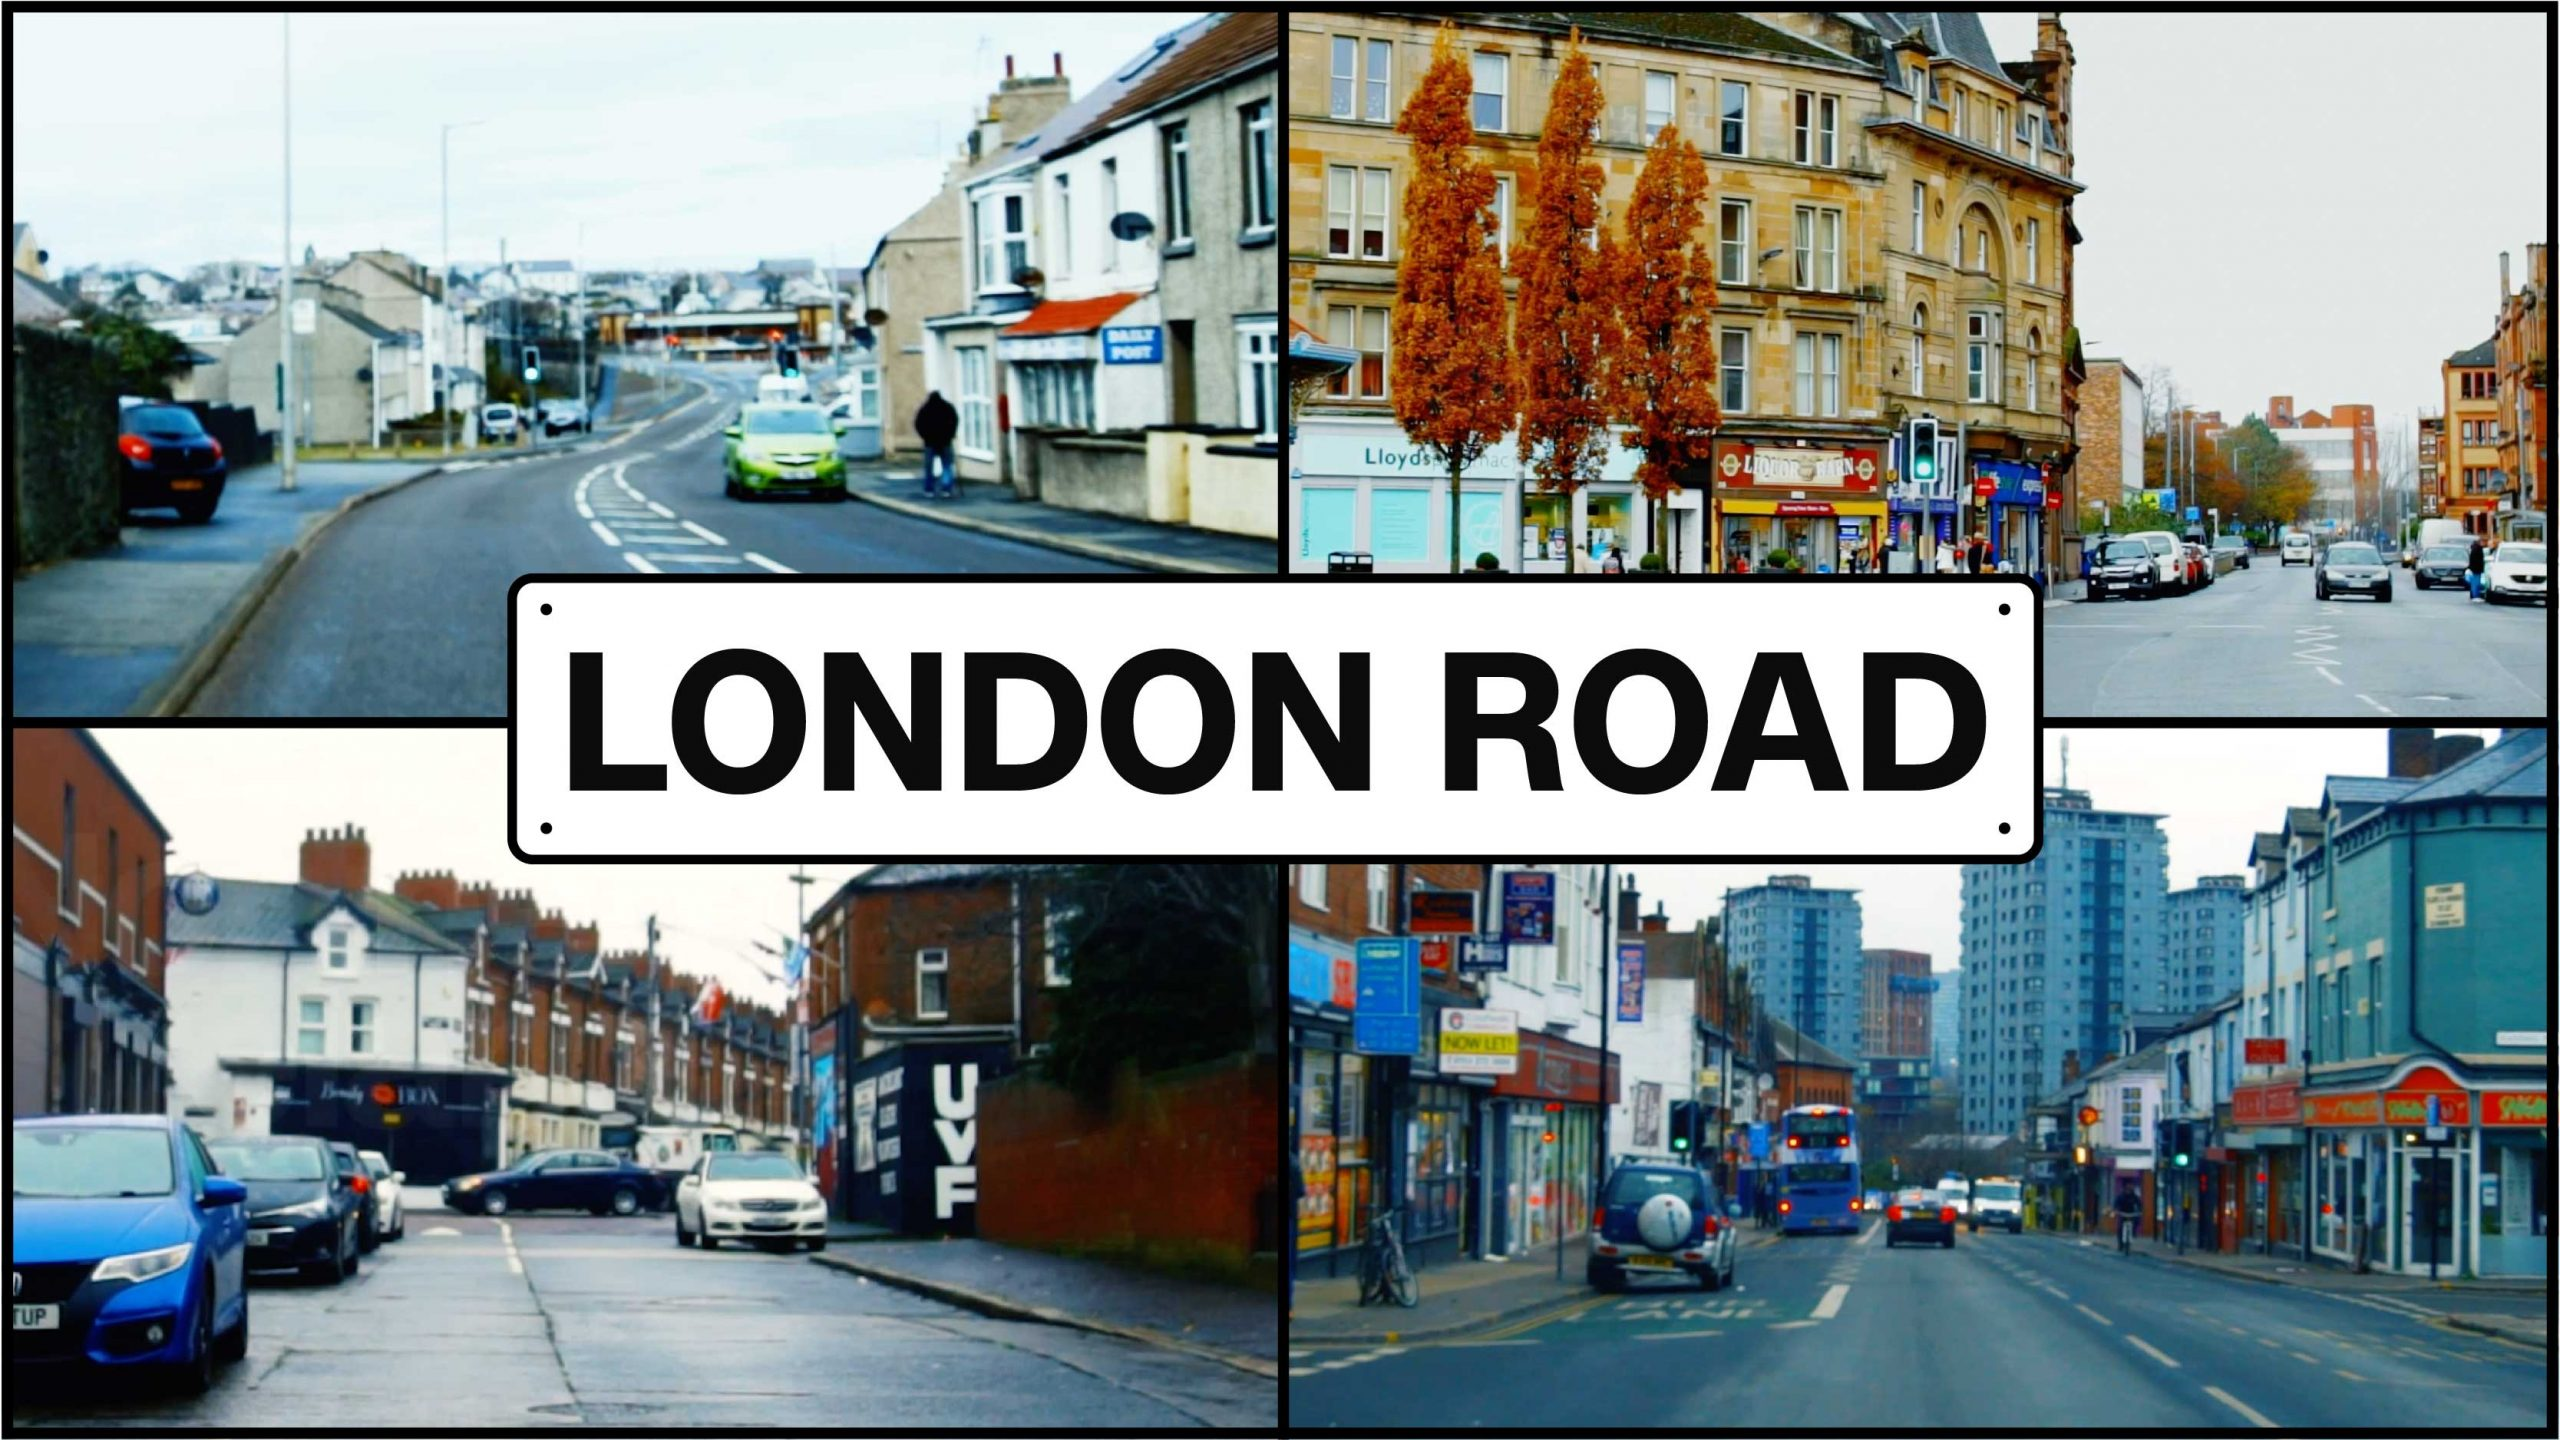 london-road_16x9.jpg